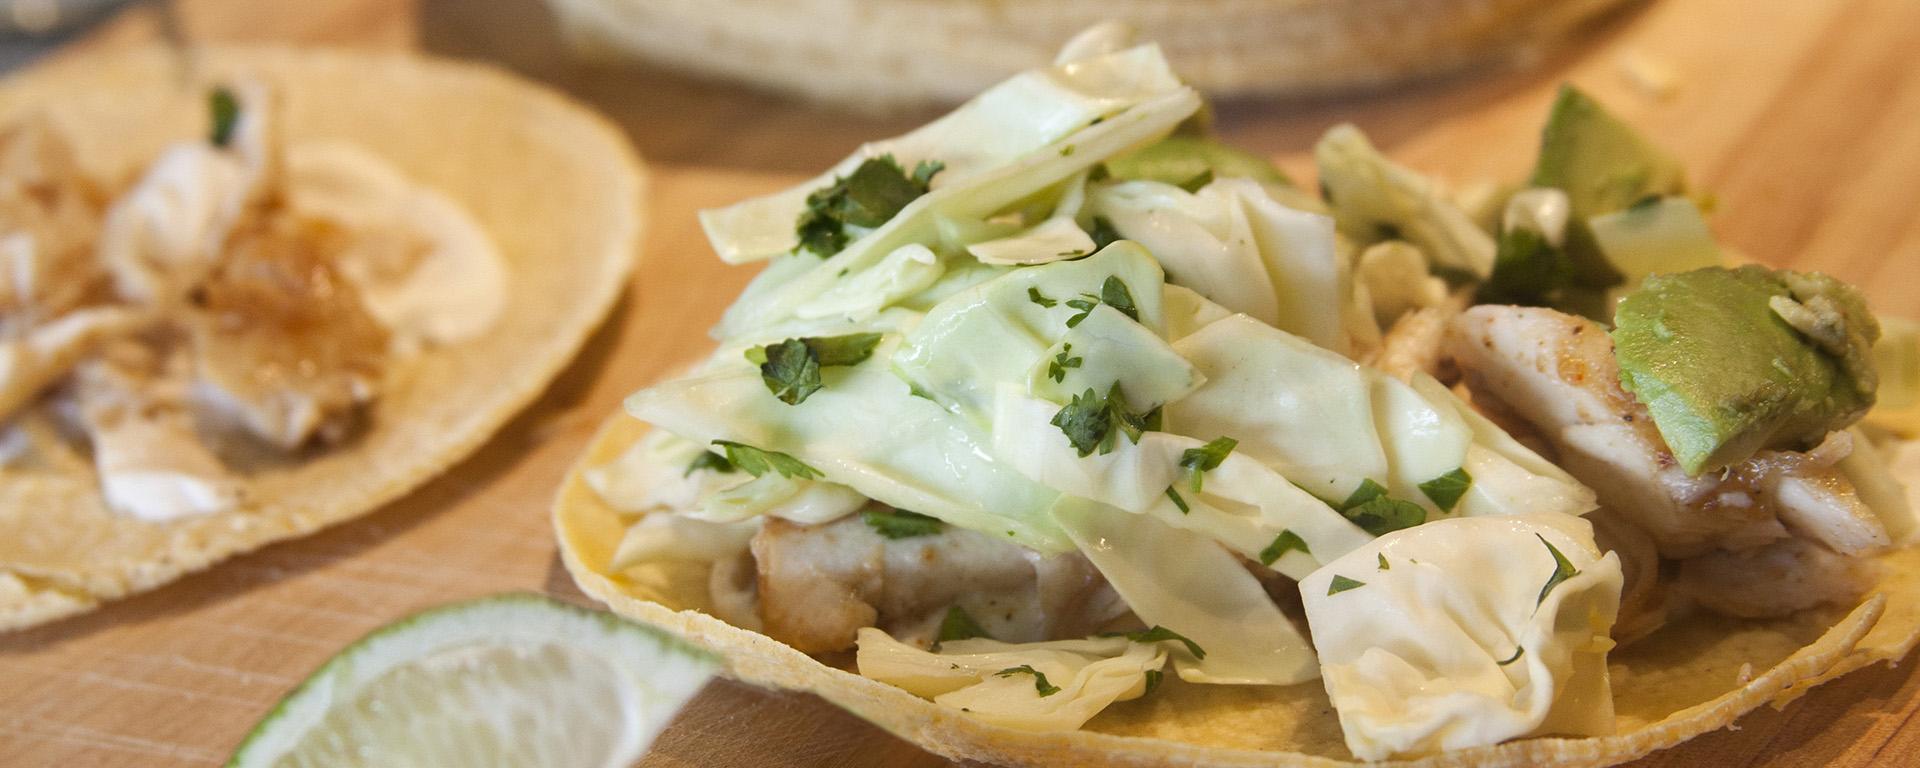 baja-fish-tacos-featured